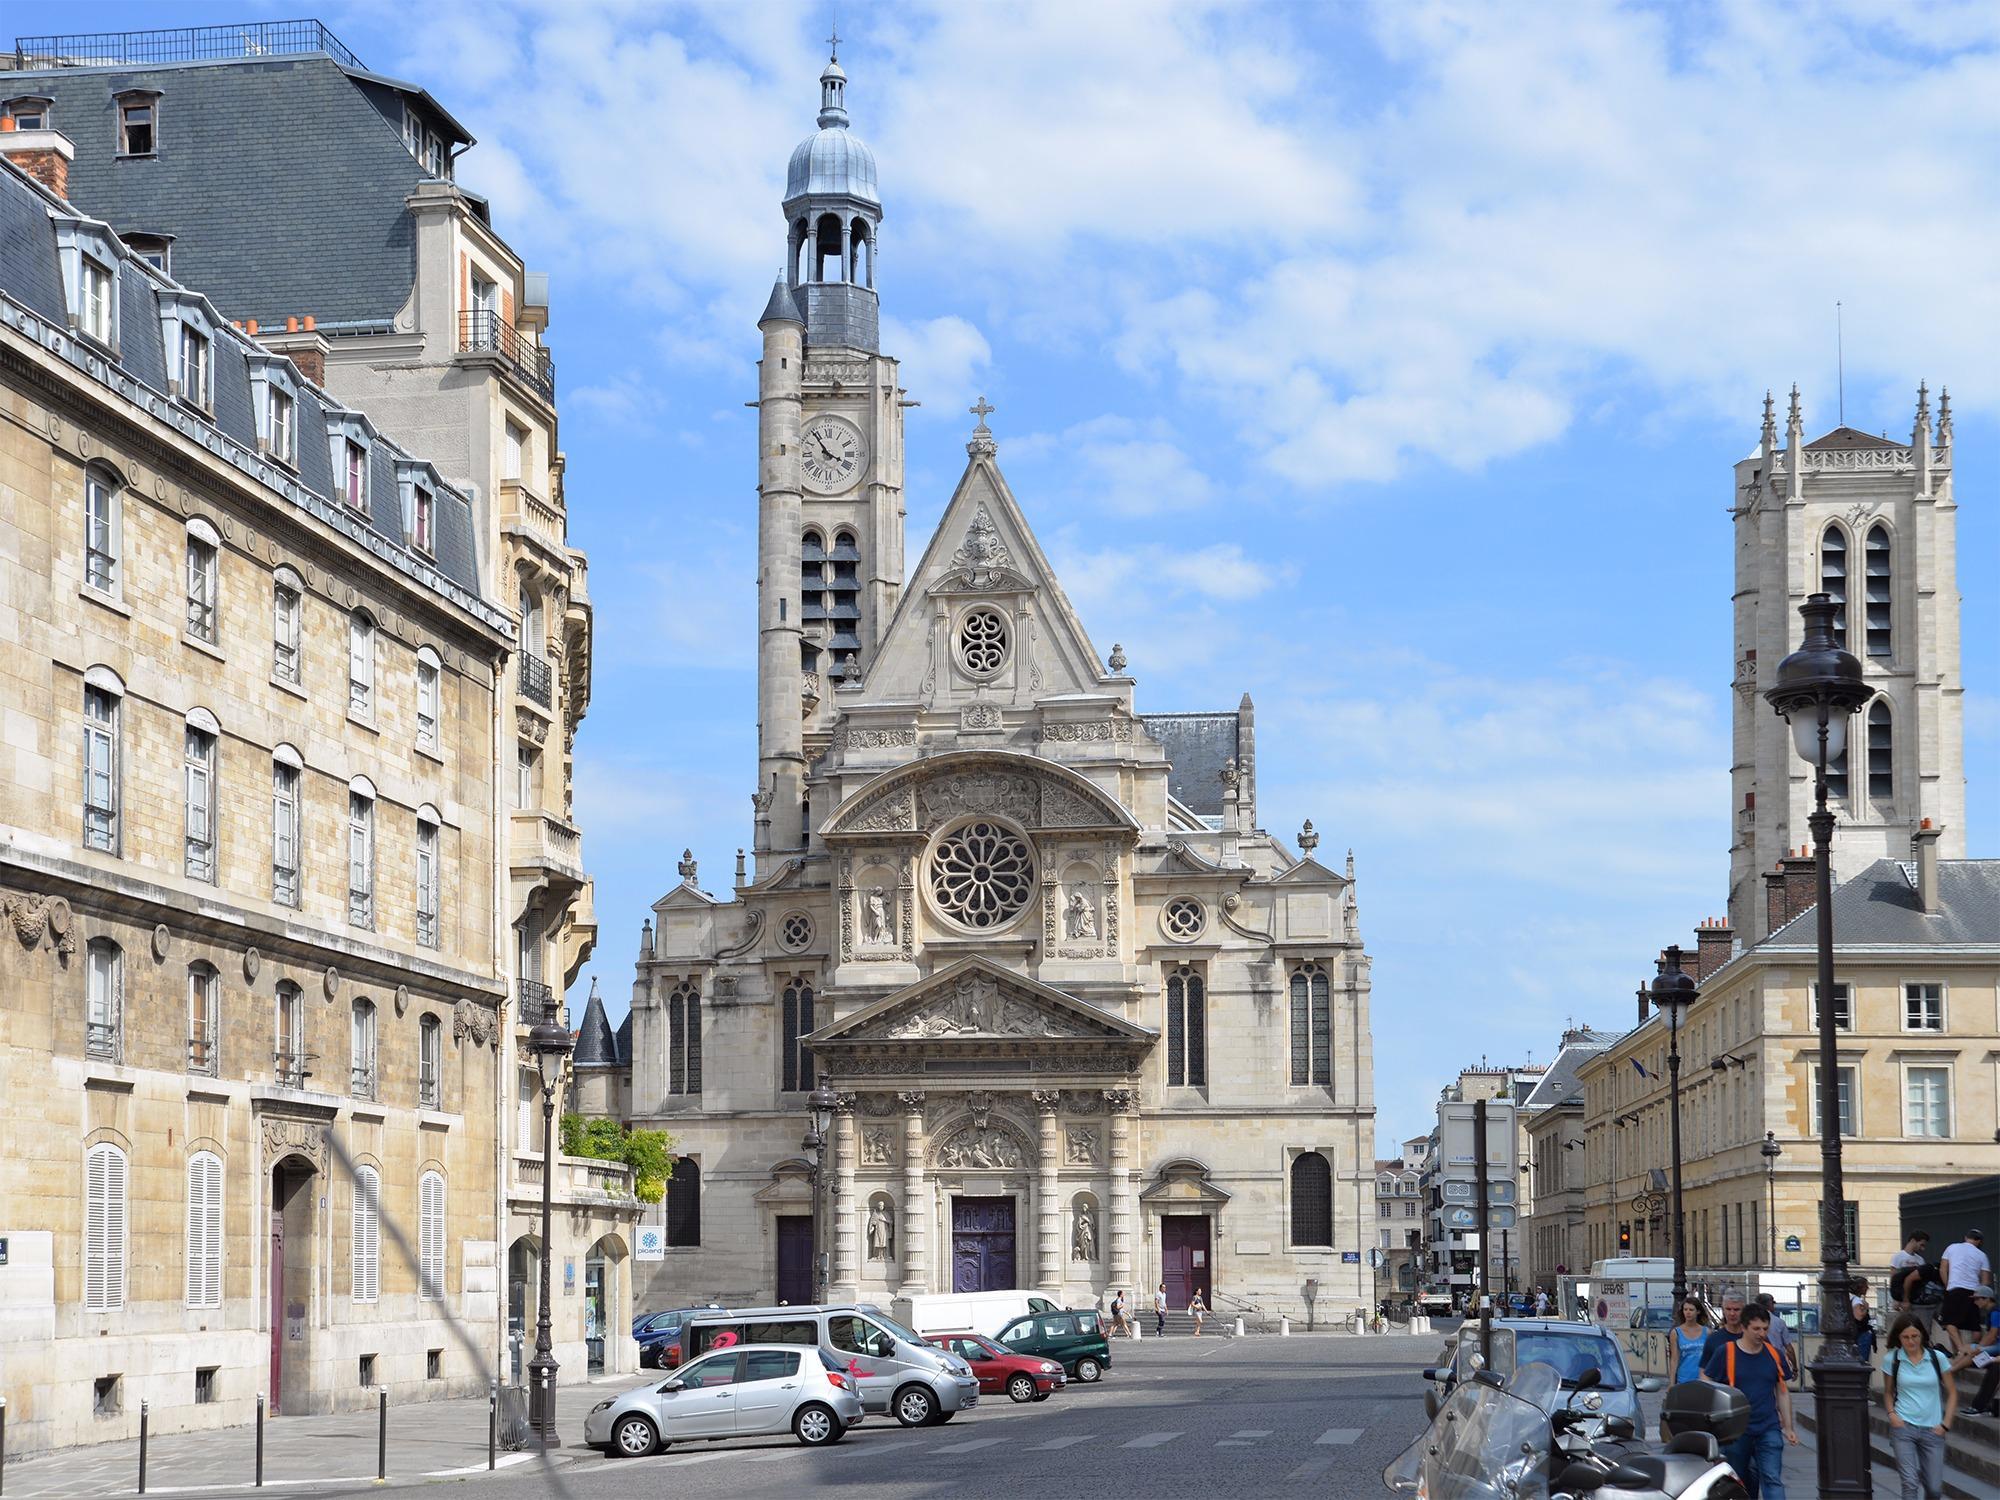 Церковь Сент-Этьен-дю-Мон, Париж, Франция